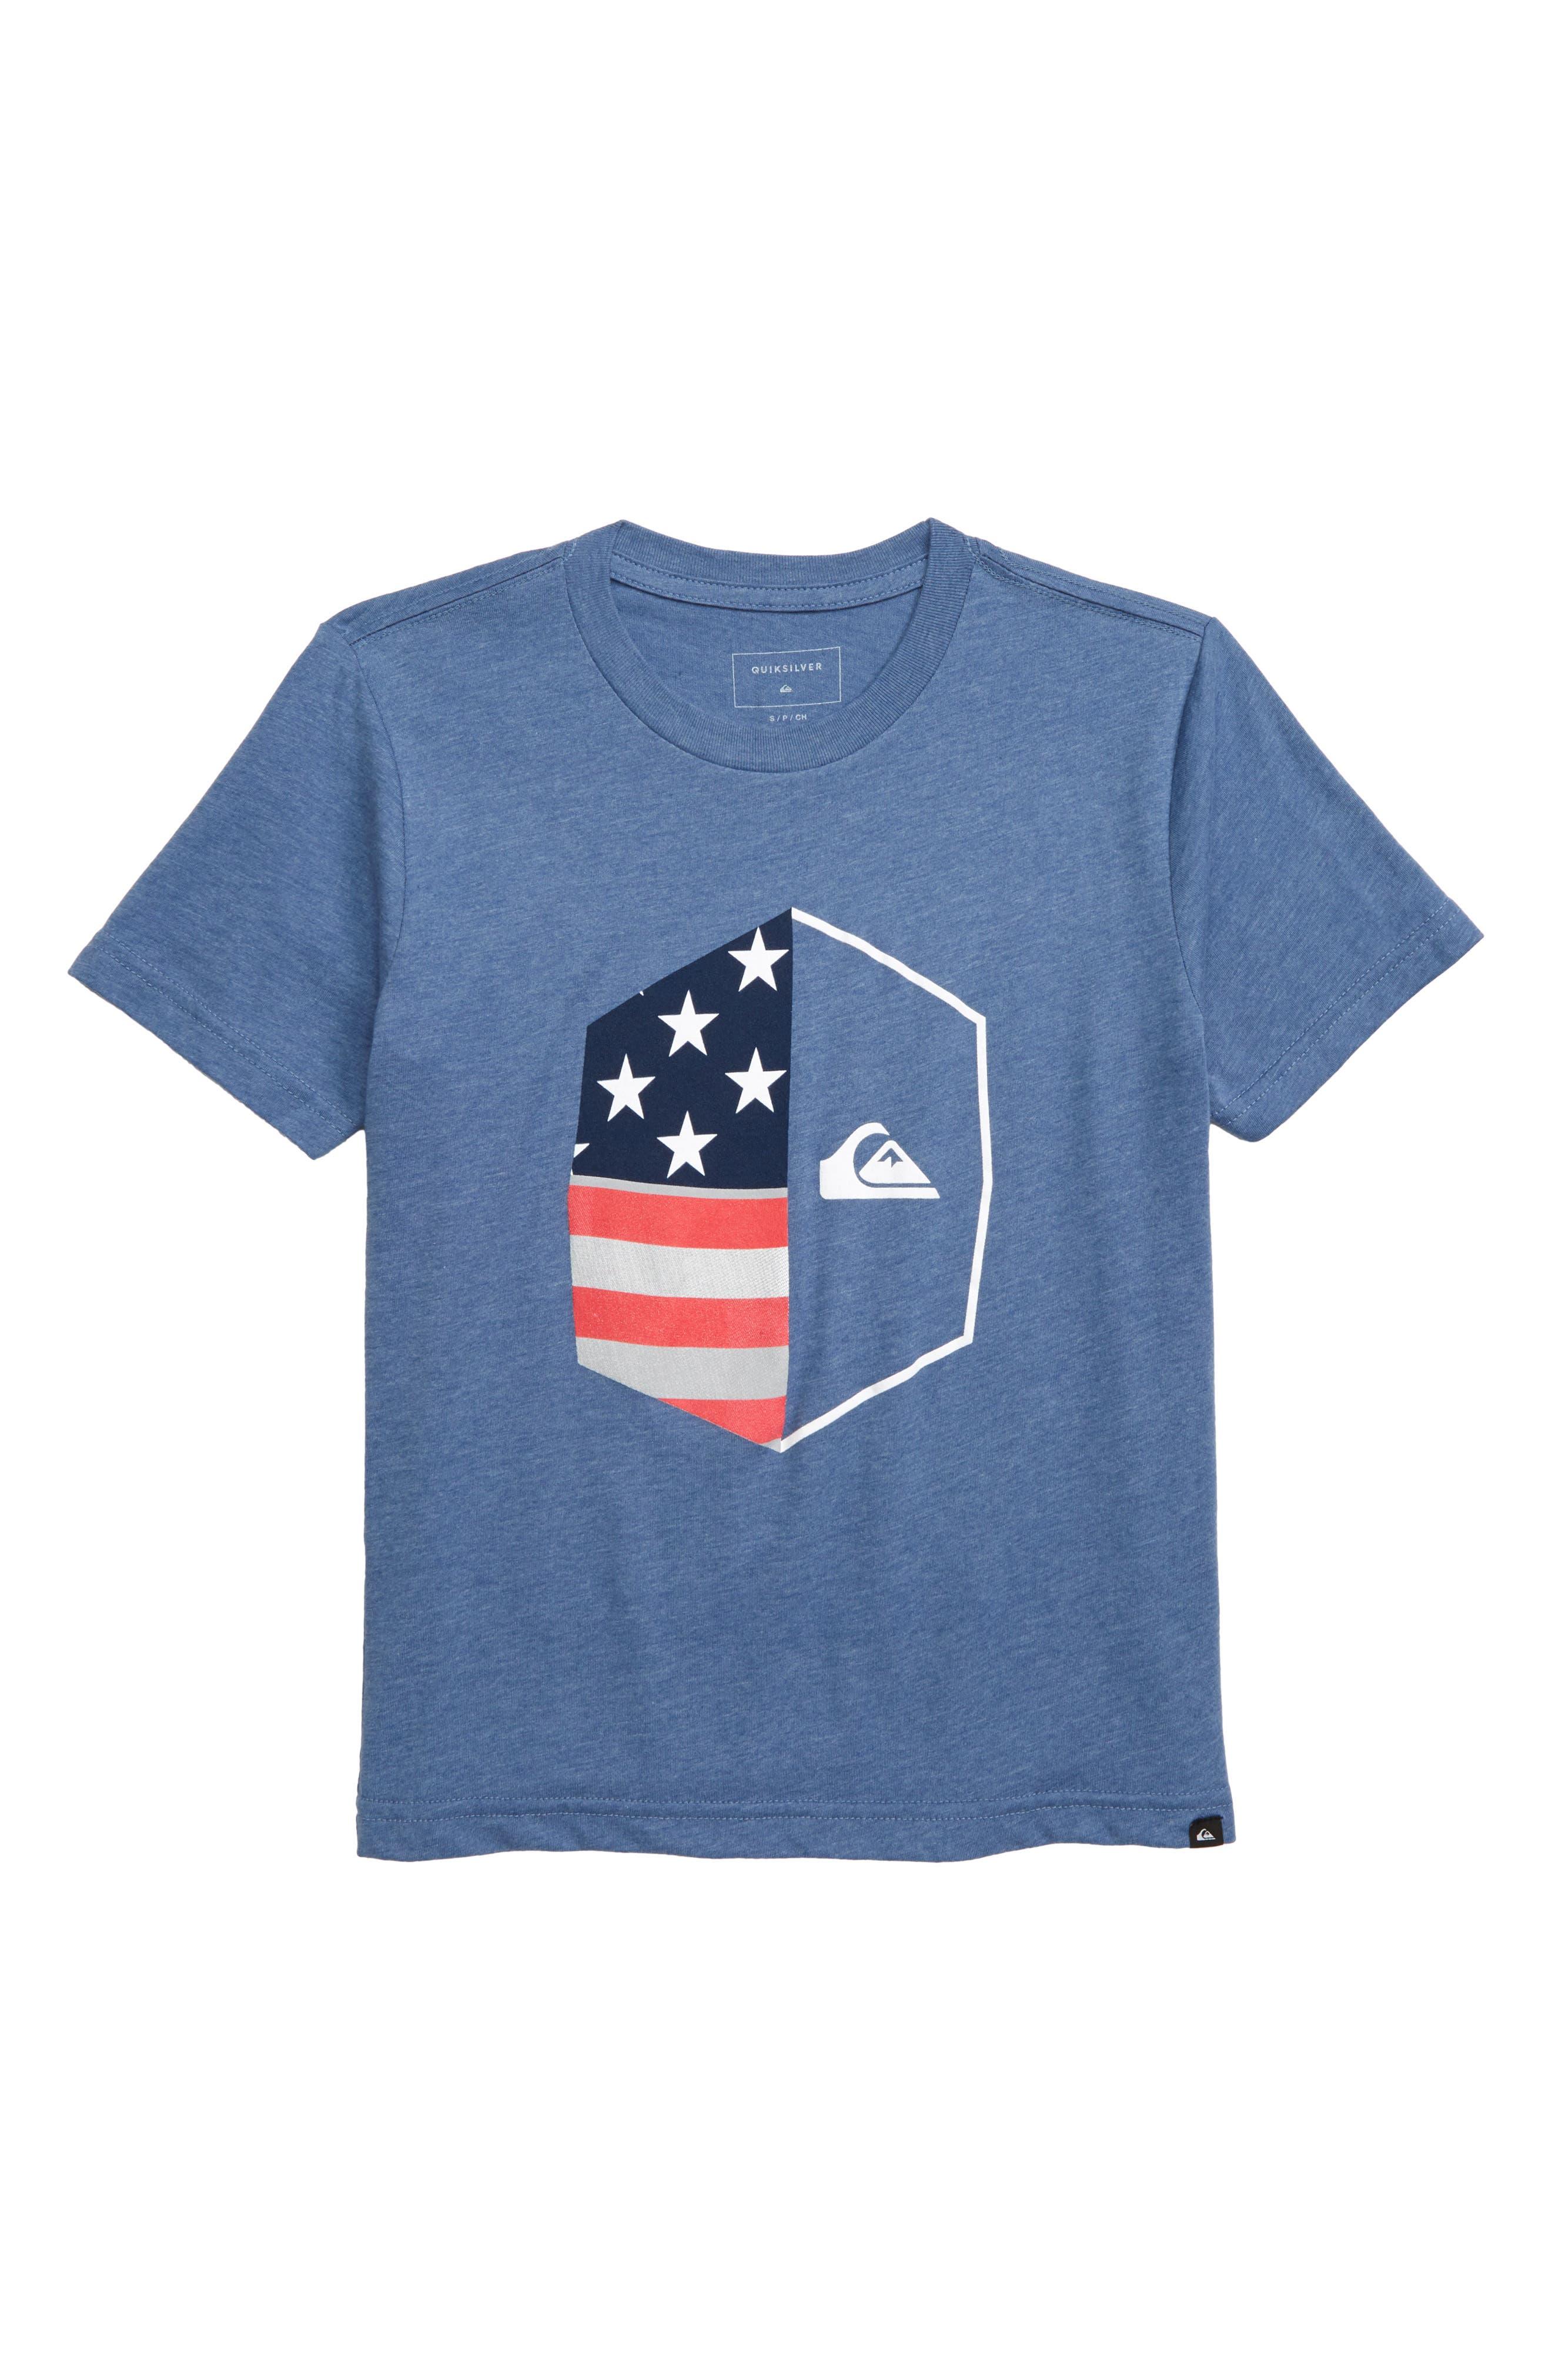 Boys Quiksilver Americana Graphic TShirt Size XL (16)  Blue